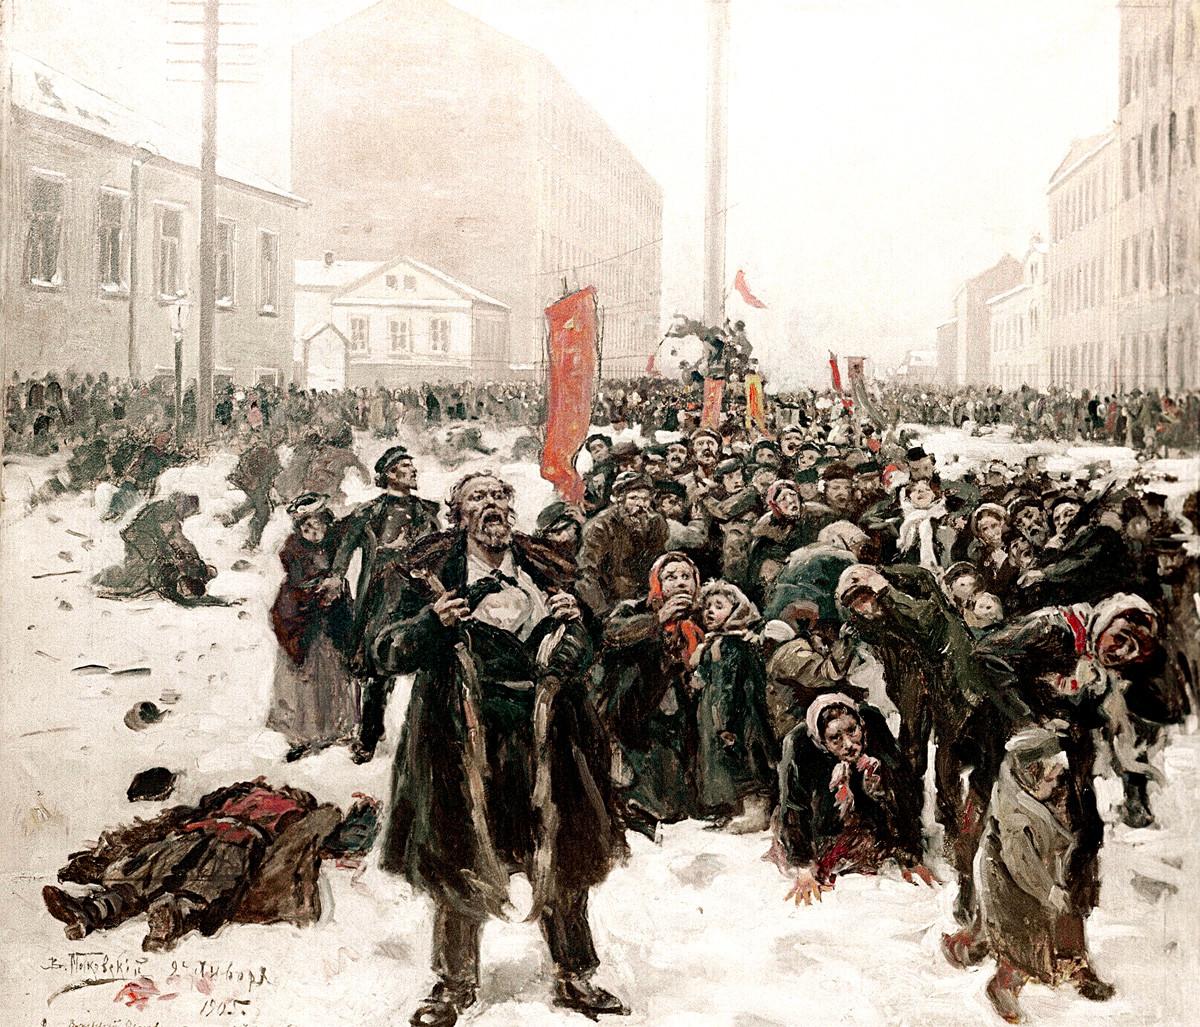 'El 9 de enero de 1905 en la isla Vasílievski', obra de Vladímir Makovski.